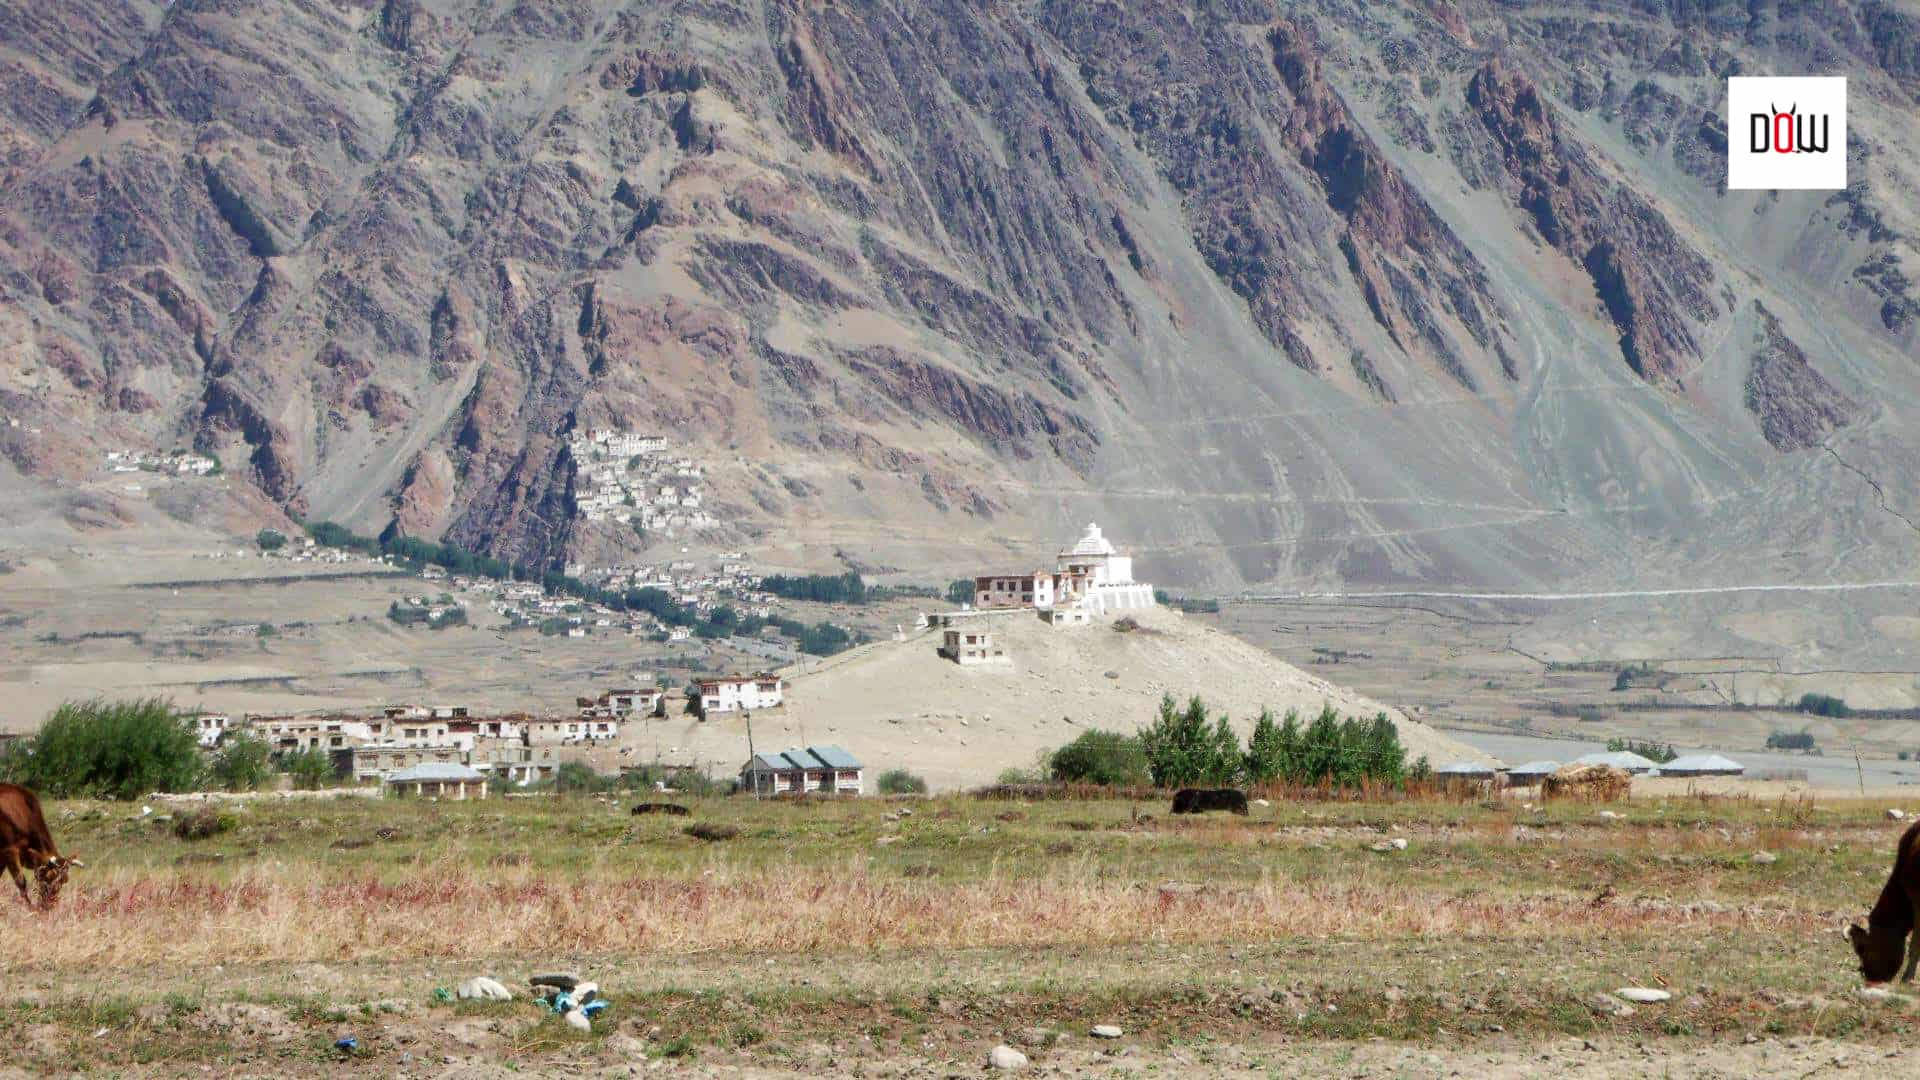 Karsha Monastery near Padum, a distant view